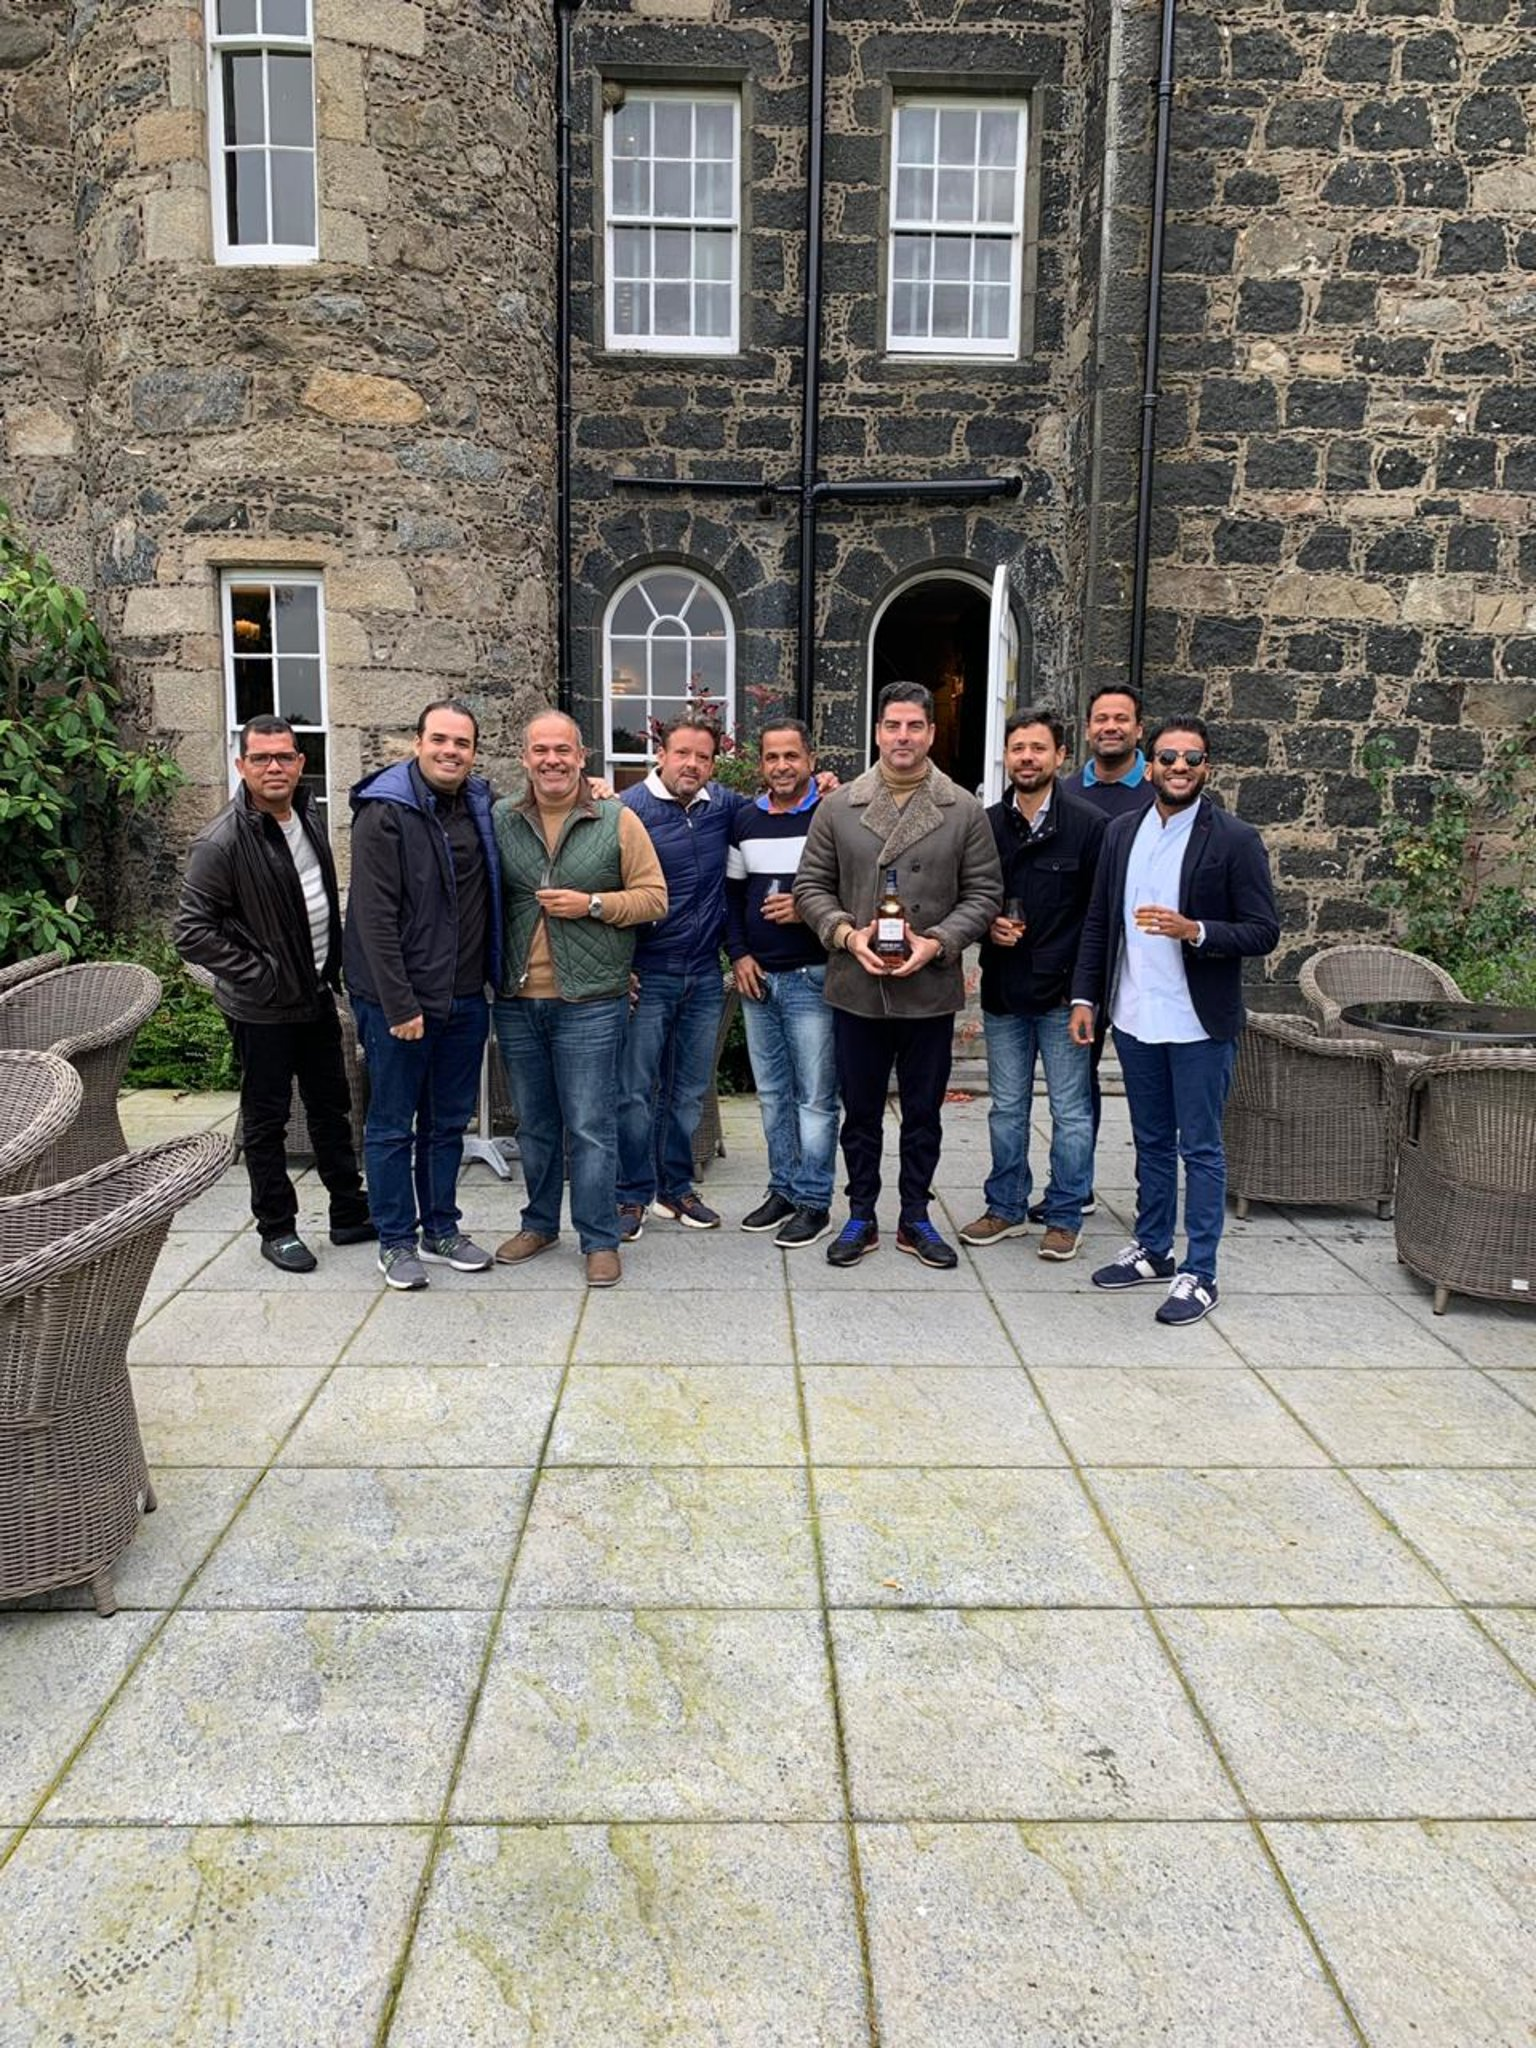 José Antonio Pérez, José Luis Montero, Ariel Tavarez, Freddy Almonte, Lorenzo Rojas, Luis Arturo Carbuccia, Carlos Núñez, Víctor Matos, Oscar De Castro